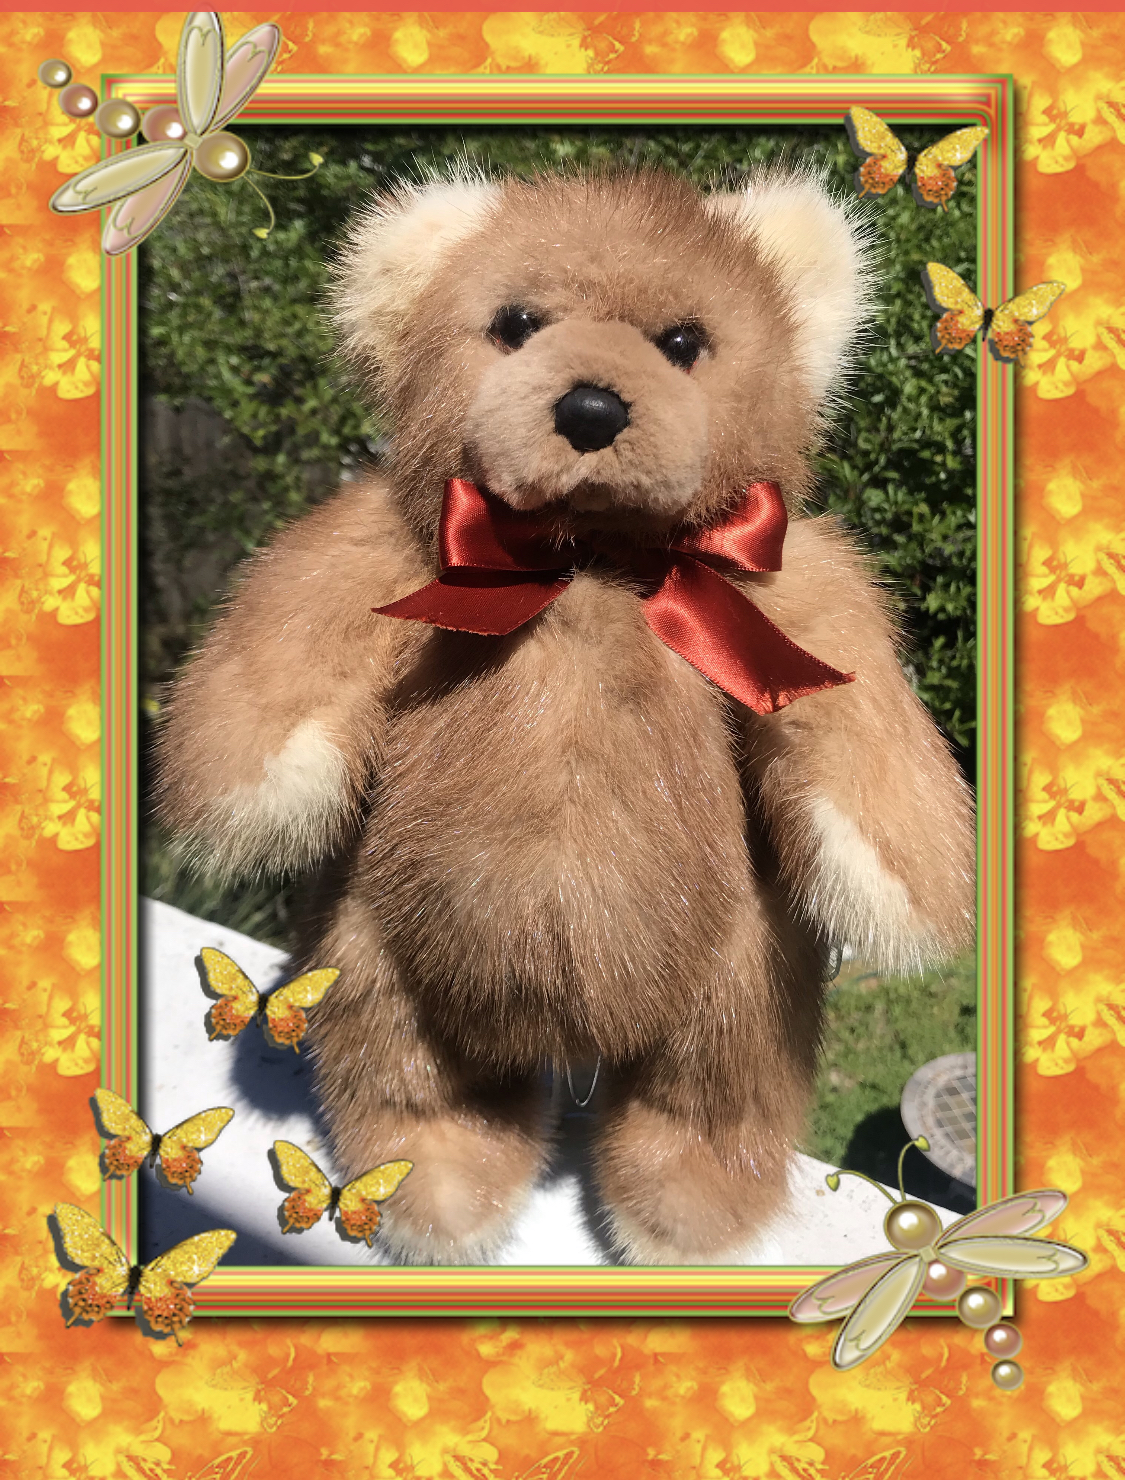 This Custom Teddy Bear was made from a Vintage Autumn Haze Mink Coat!